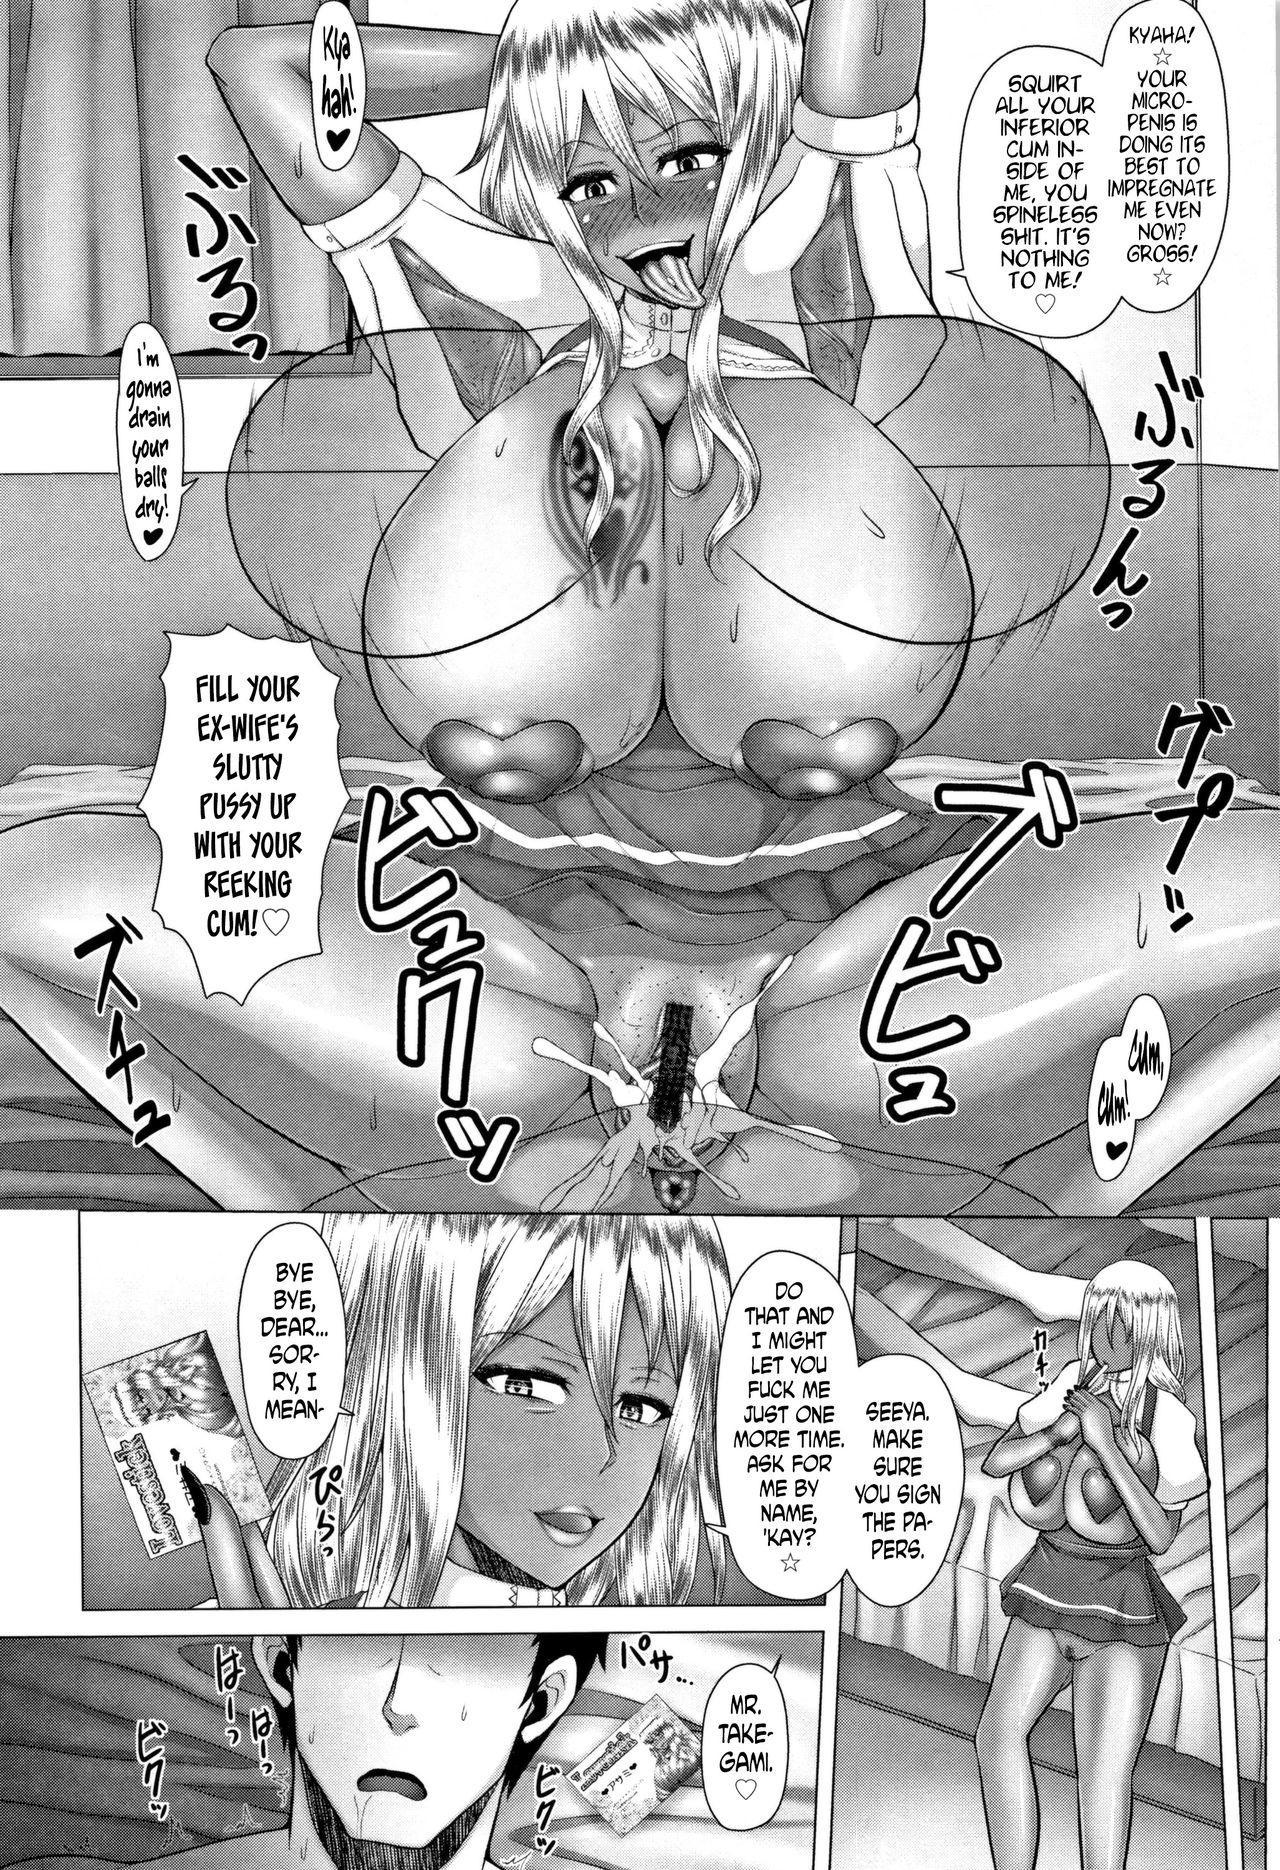 [Inoue Nanaki] Joushiki Daha! Kuro Gal Bitch-ka Seikatsu Ch. 1-3, 5-8 [English] [Dark Mac + N04h] 119